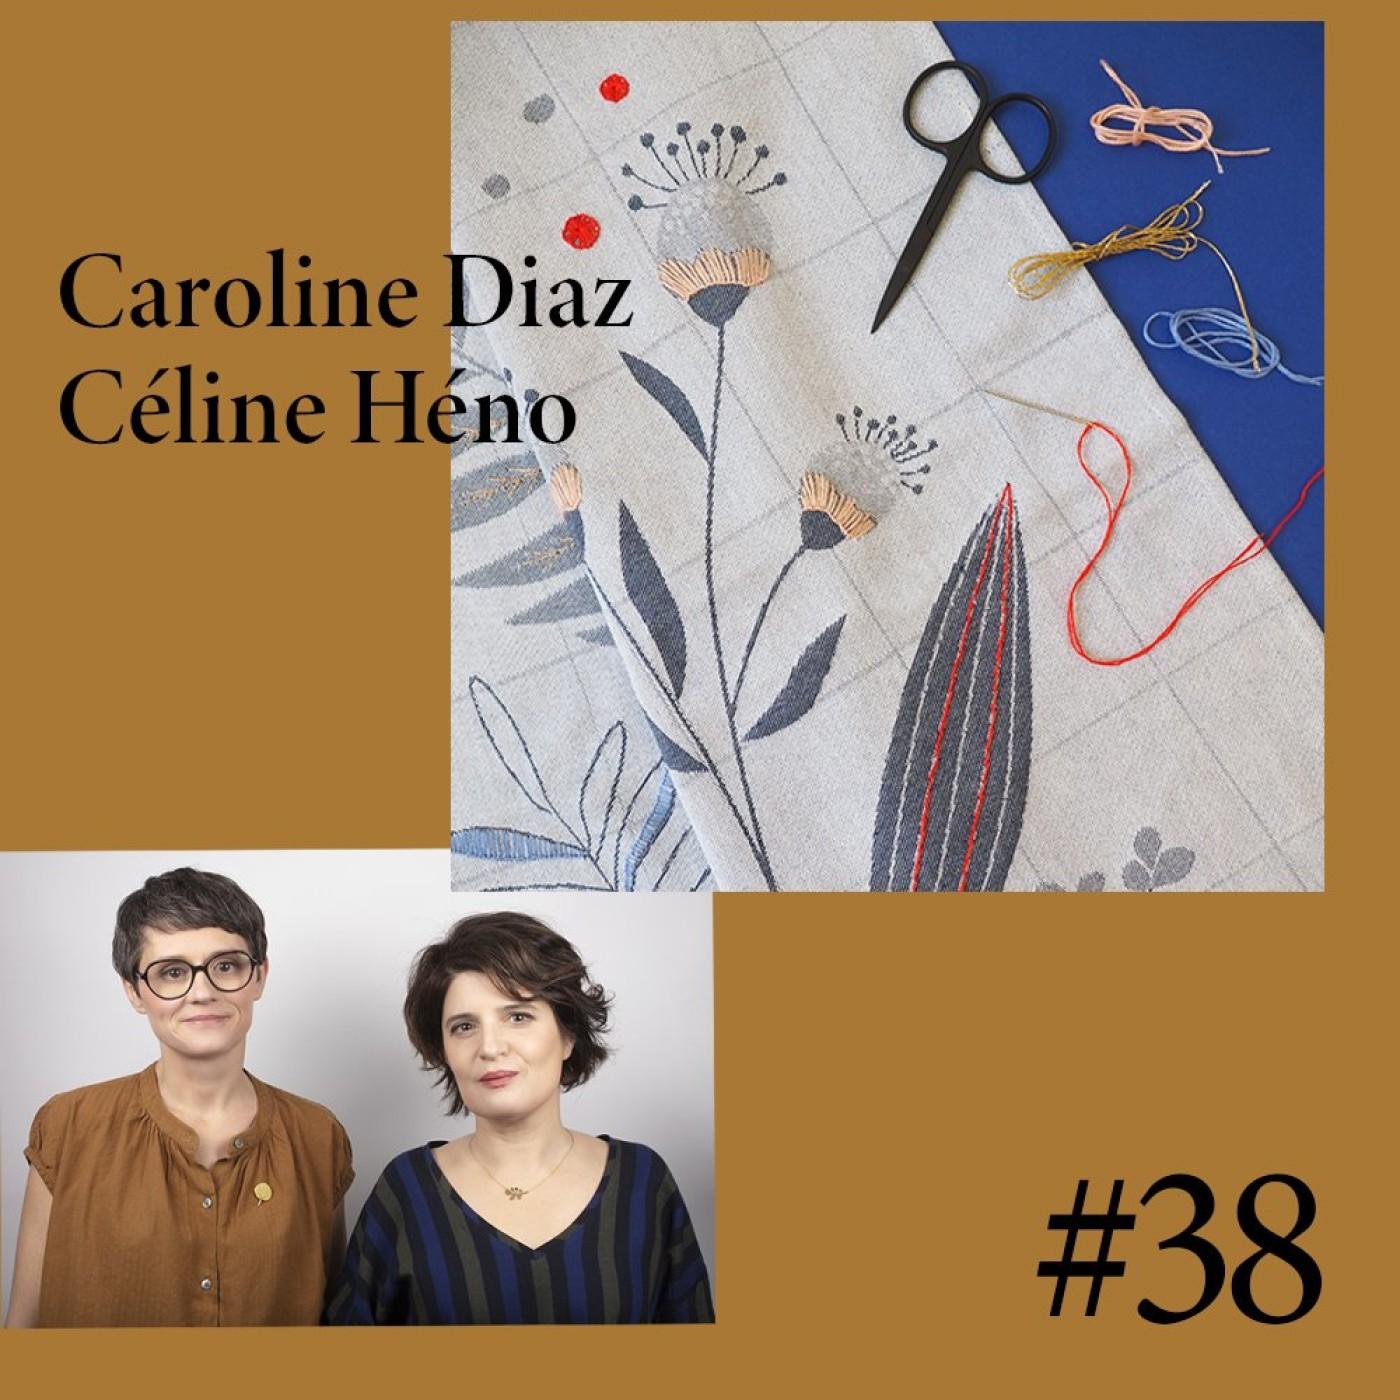 #38 Caroline Diaz et Céline Héno (Mini Labo)